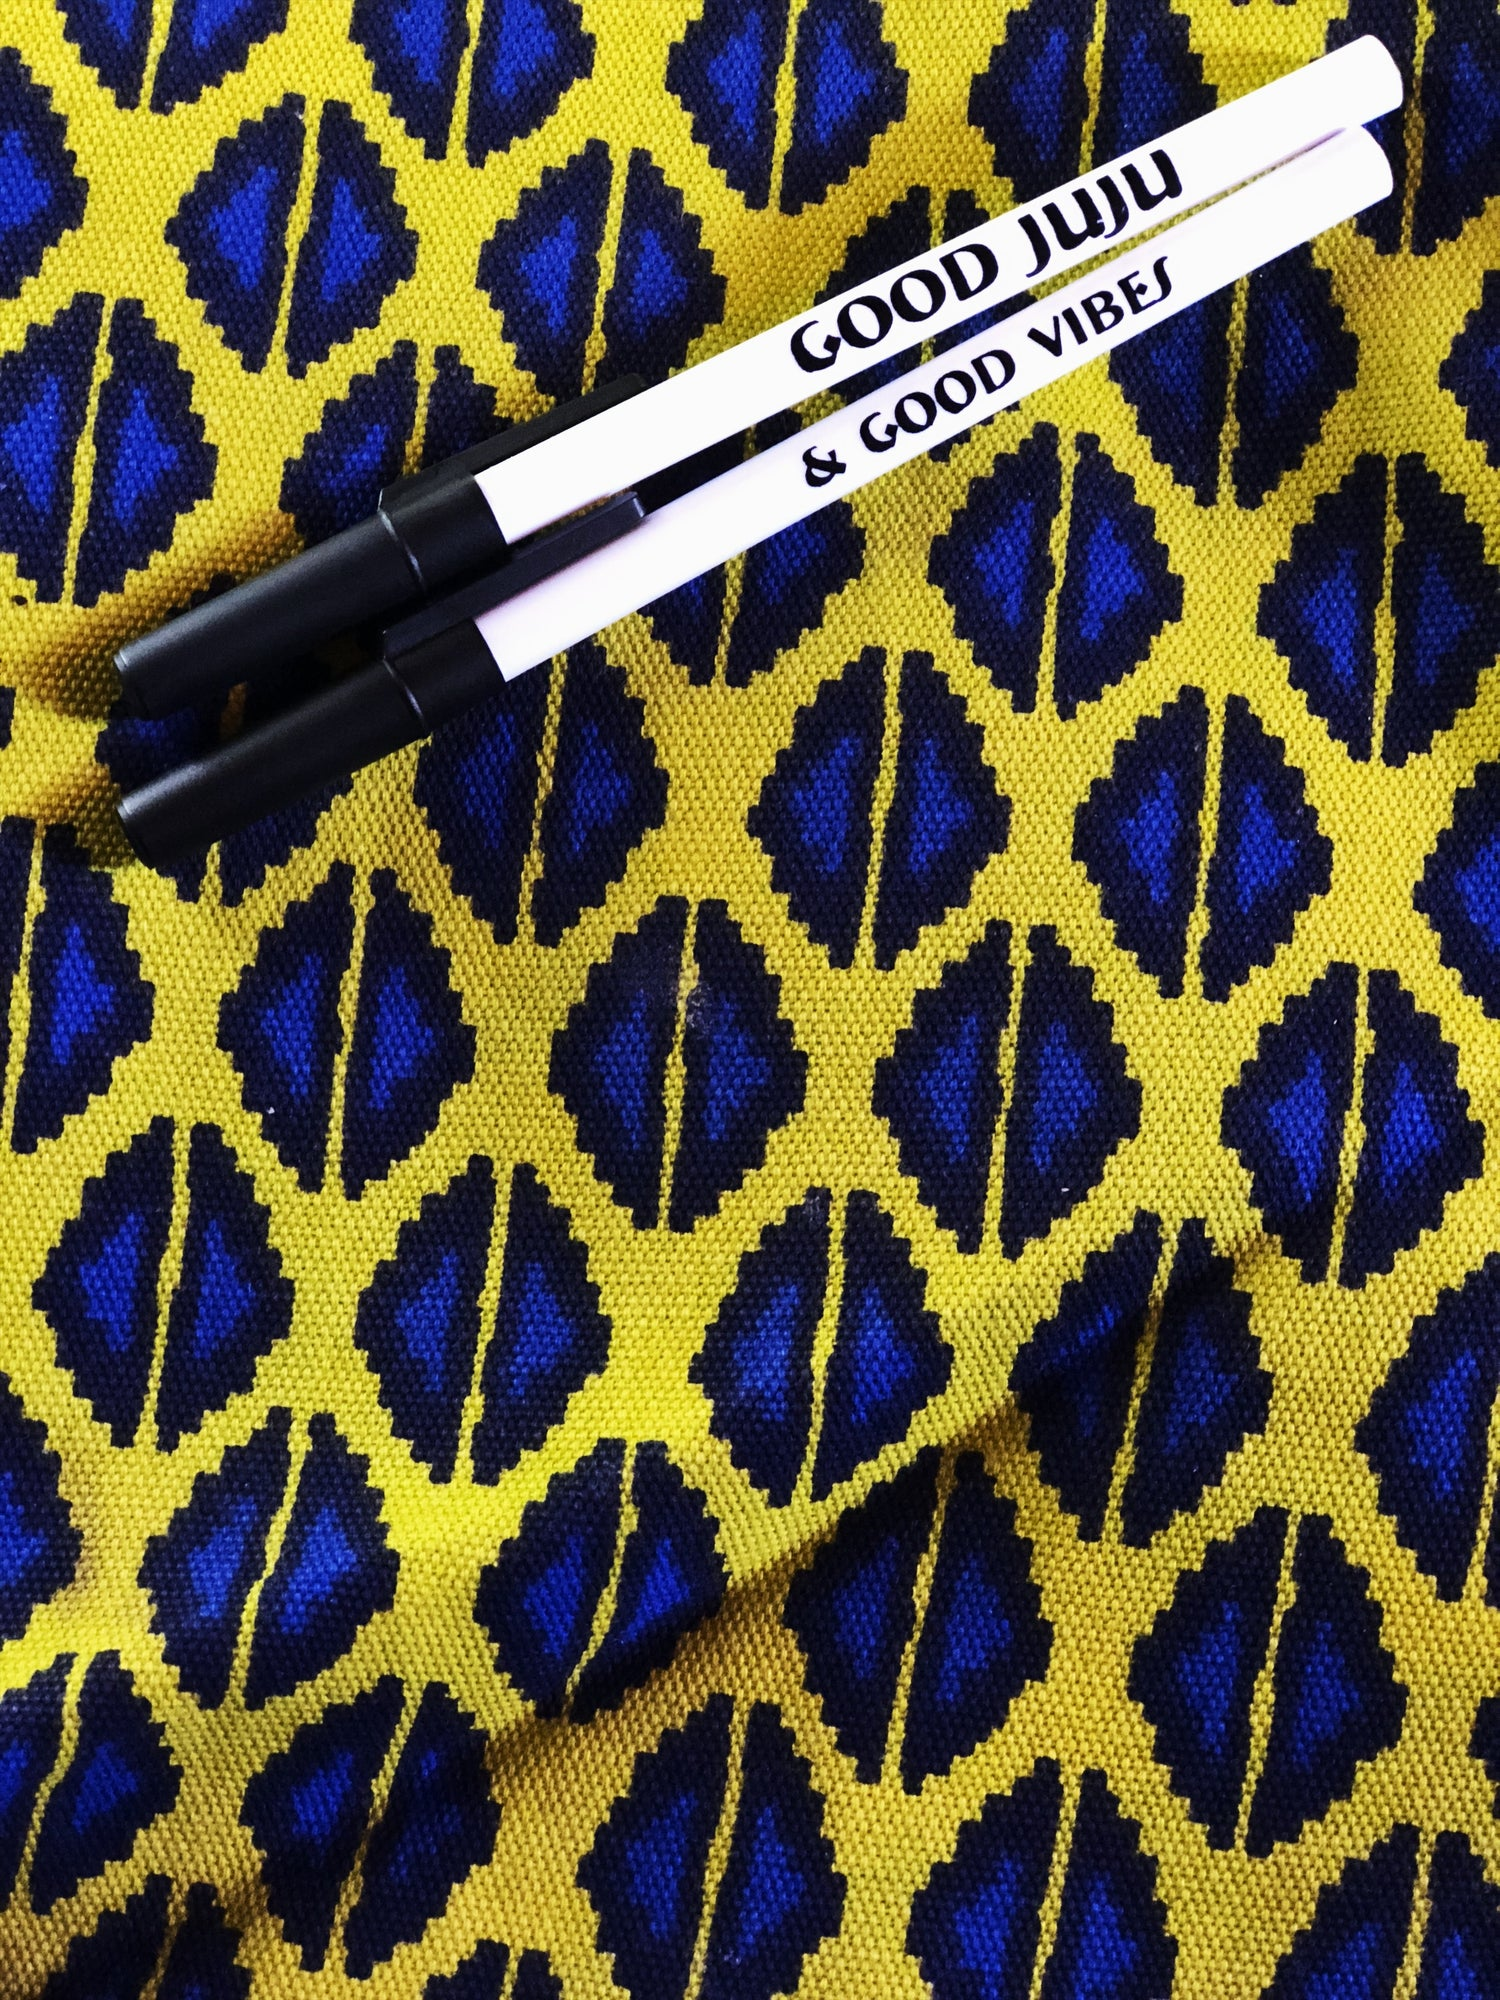 Image of Good Juju Pen Pack